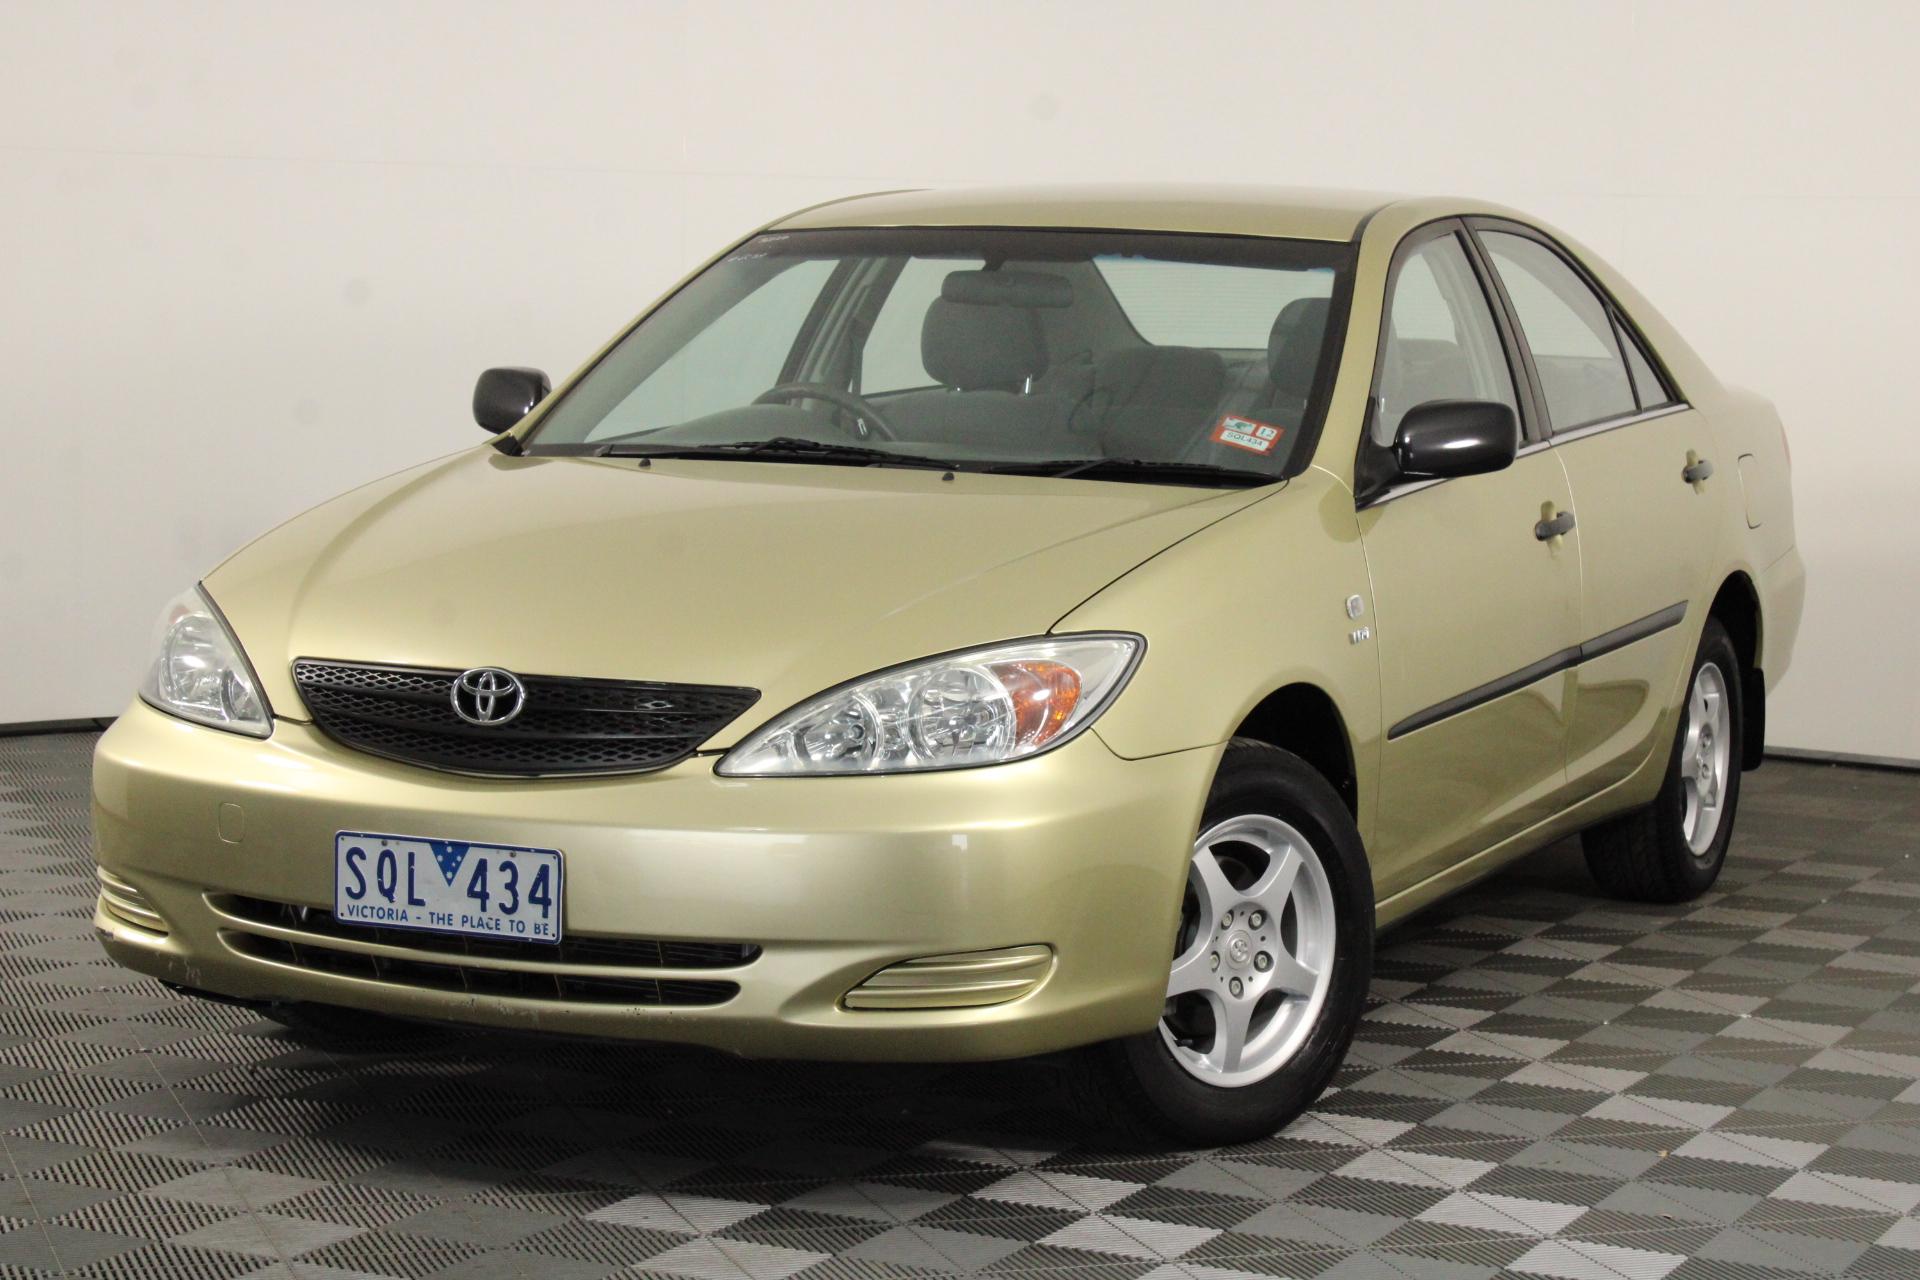 2003 Toyota Camry Altise ACV36R Automatic Sedan